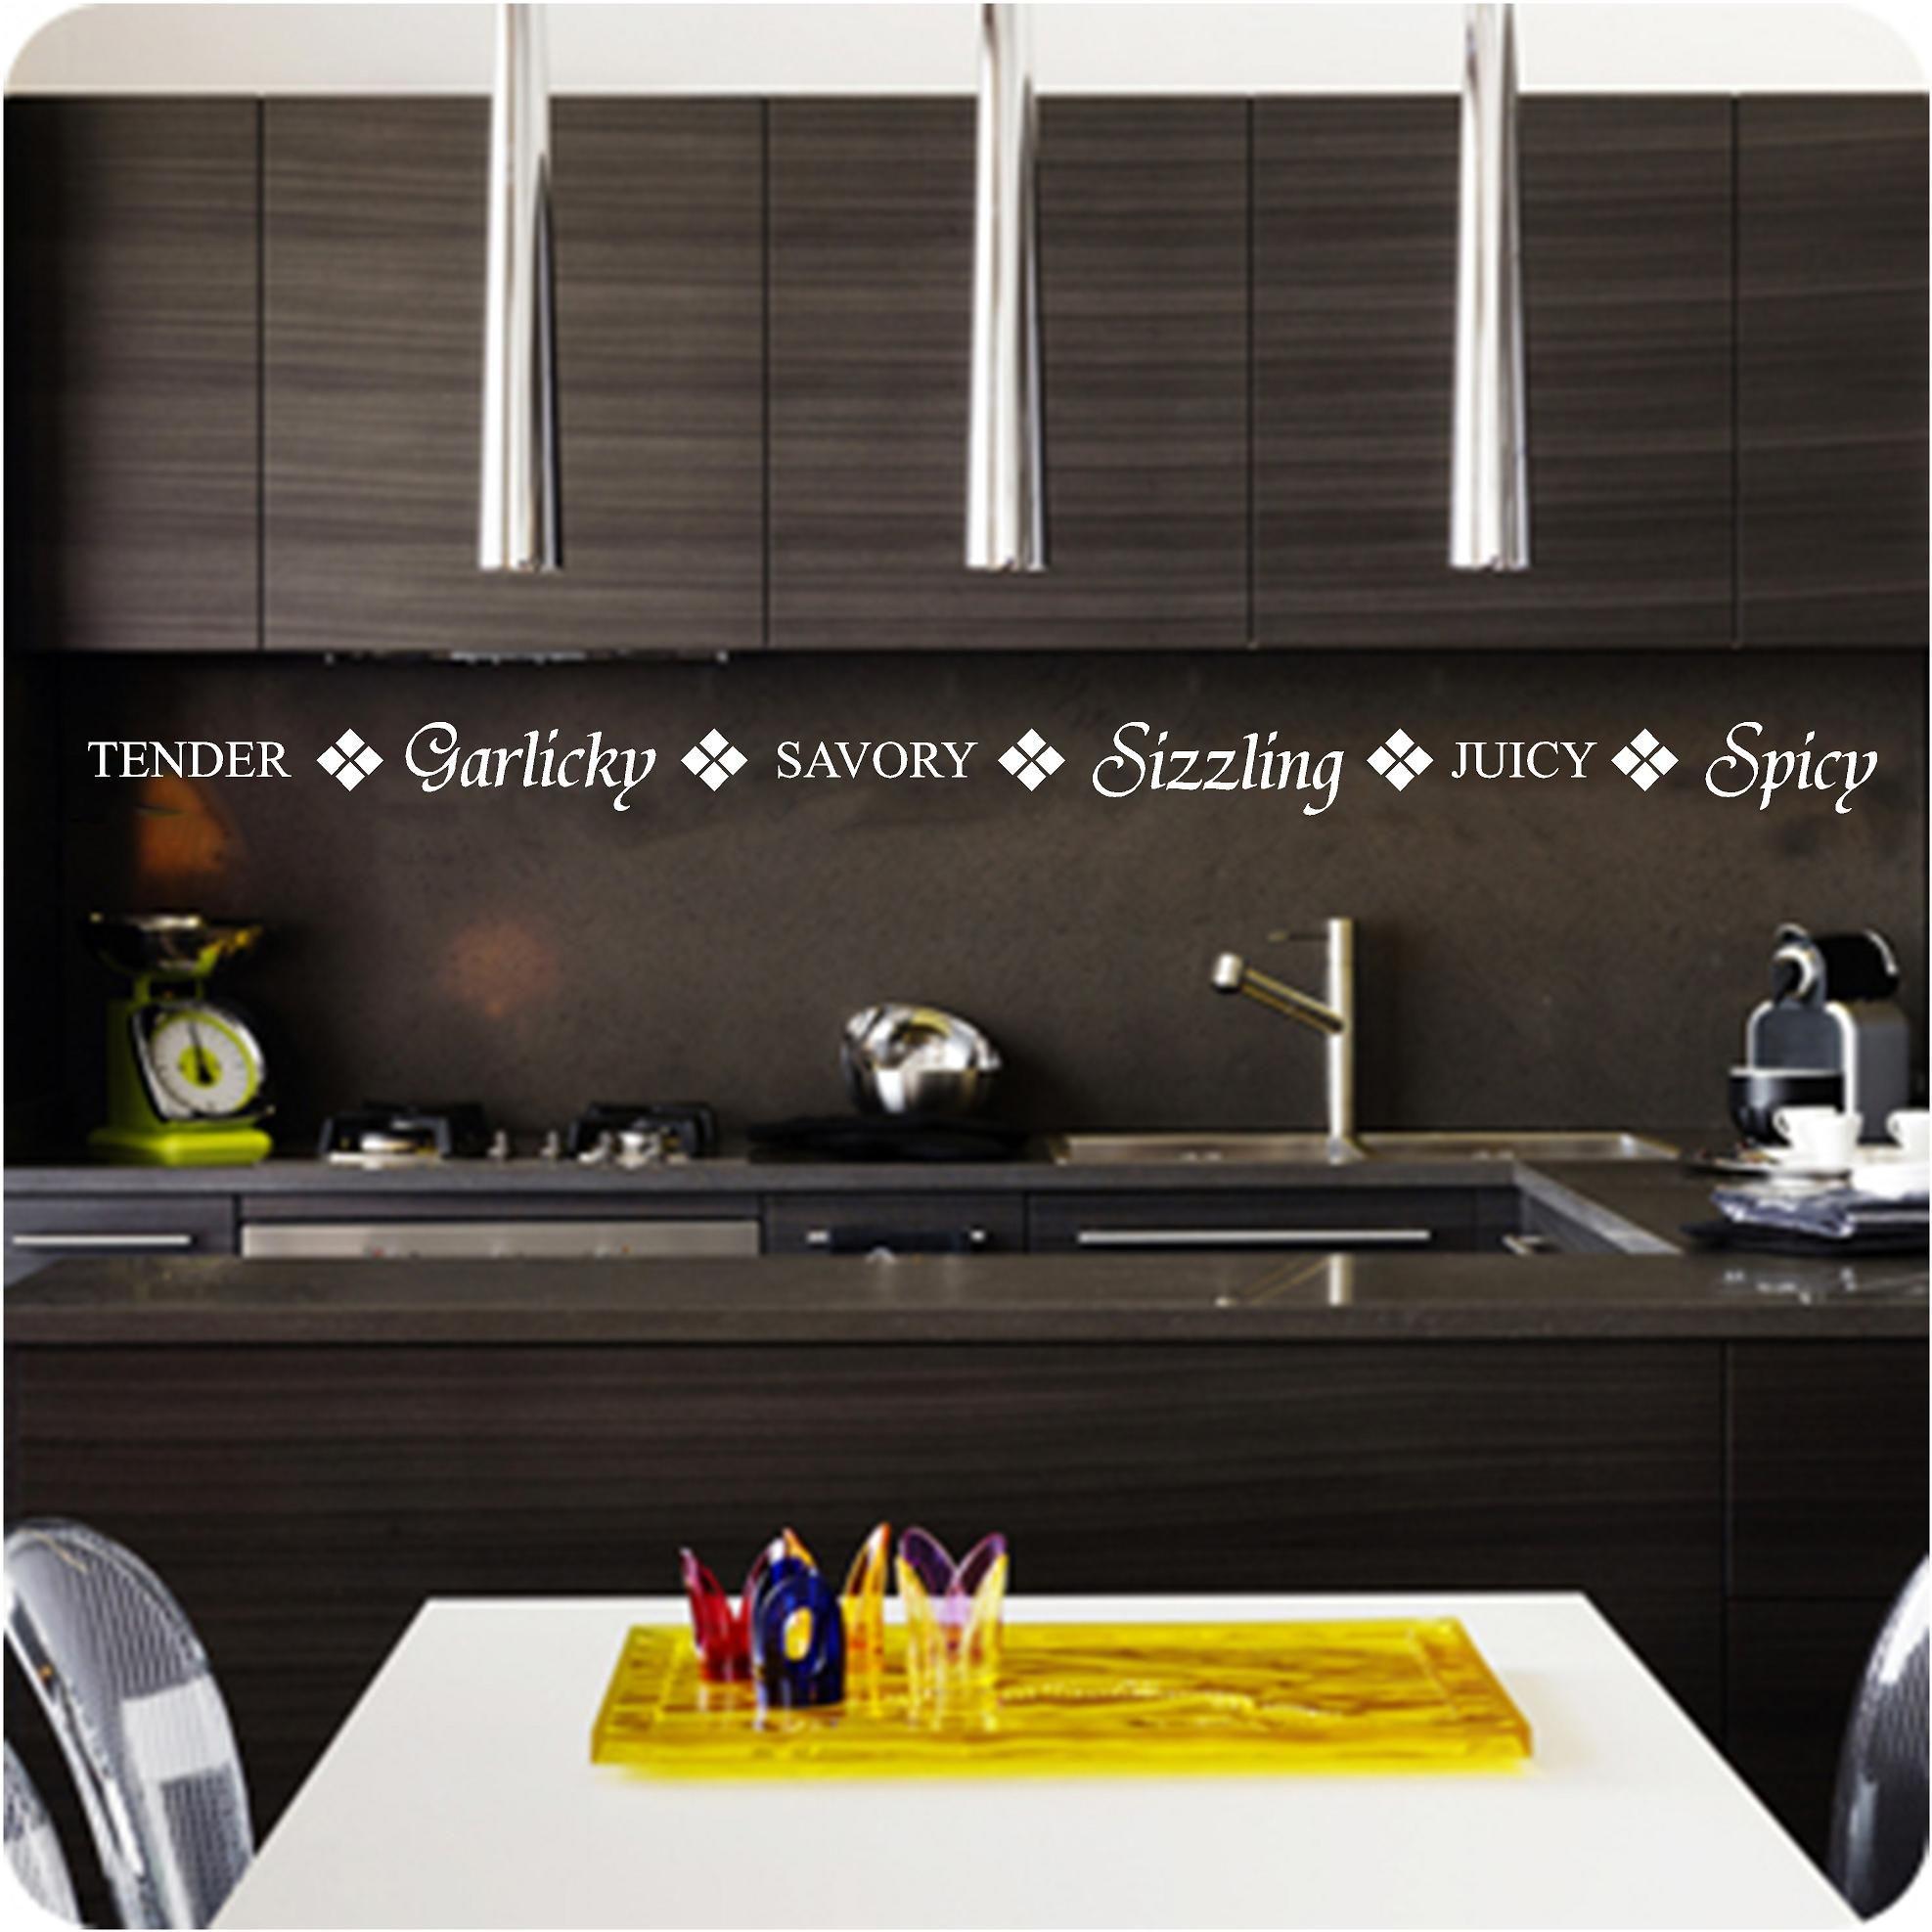 Kitchen Border Words Vinyl Wall Art Decals Free Uk P P 10 99